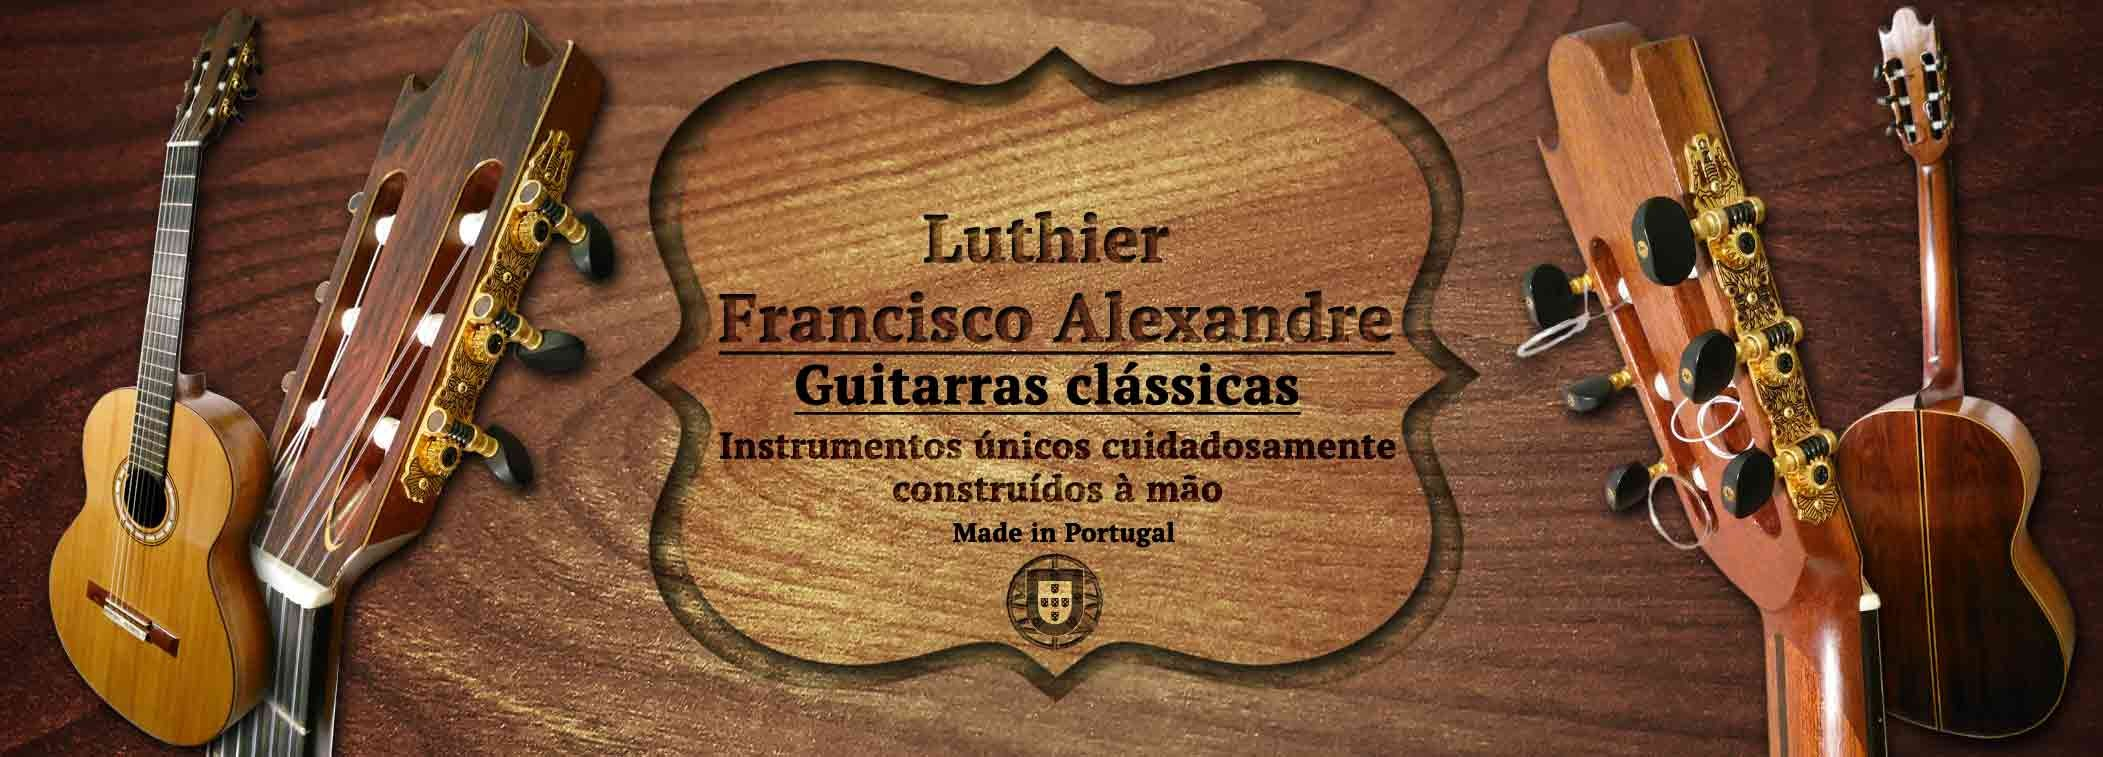 Guitarra clássica luthier Francisco Alexandre